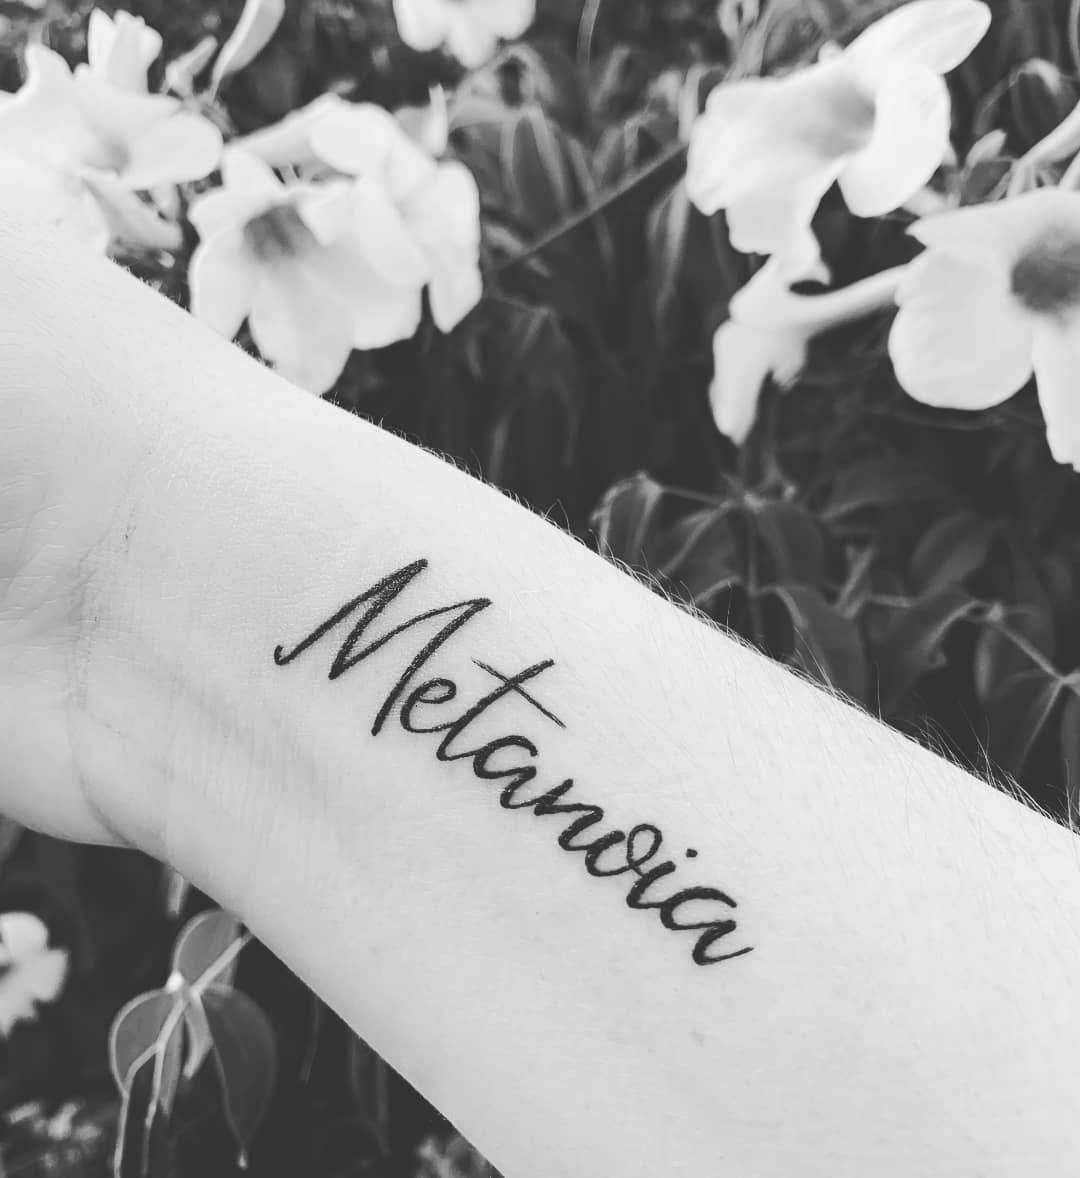 Tatuajes-en-la-muñeca-Pequeños-tatuajes-en-la-muñeca-para-las-mujeres-modernas